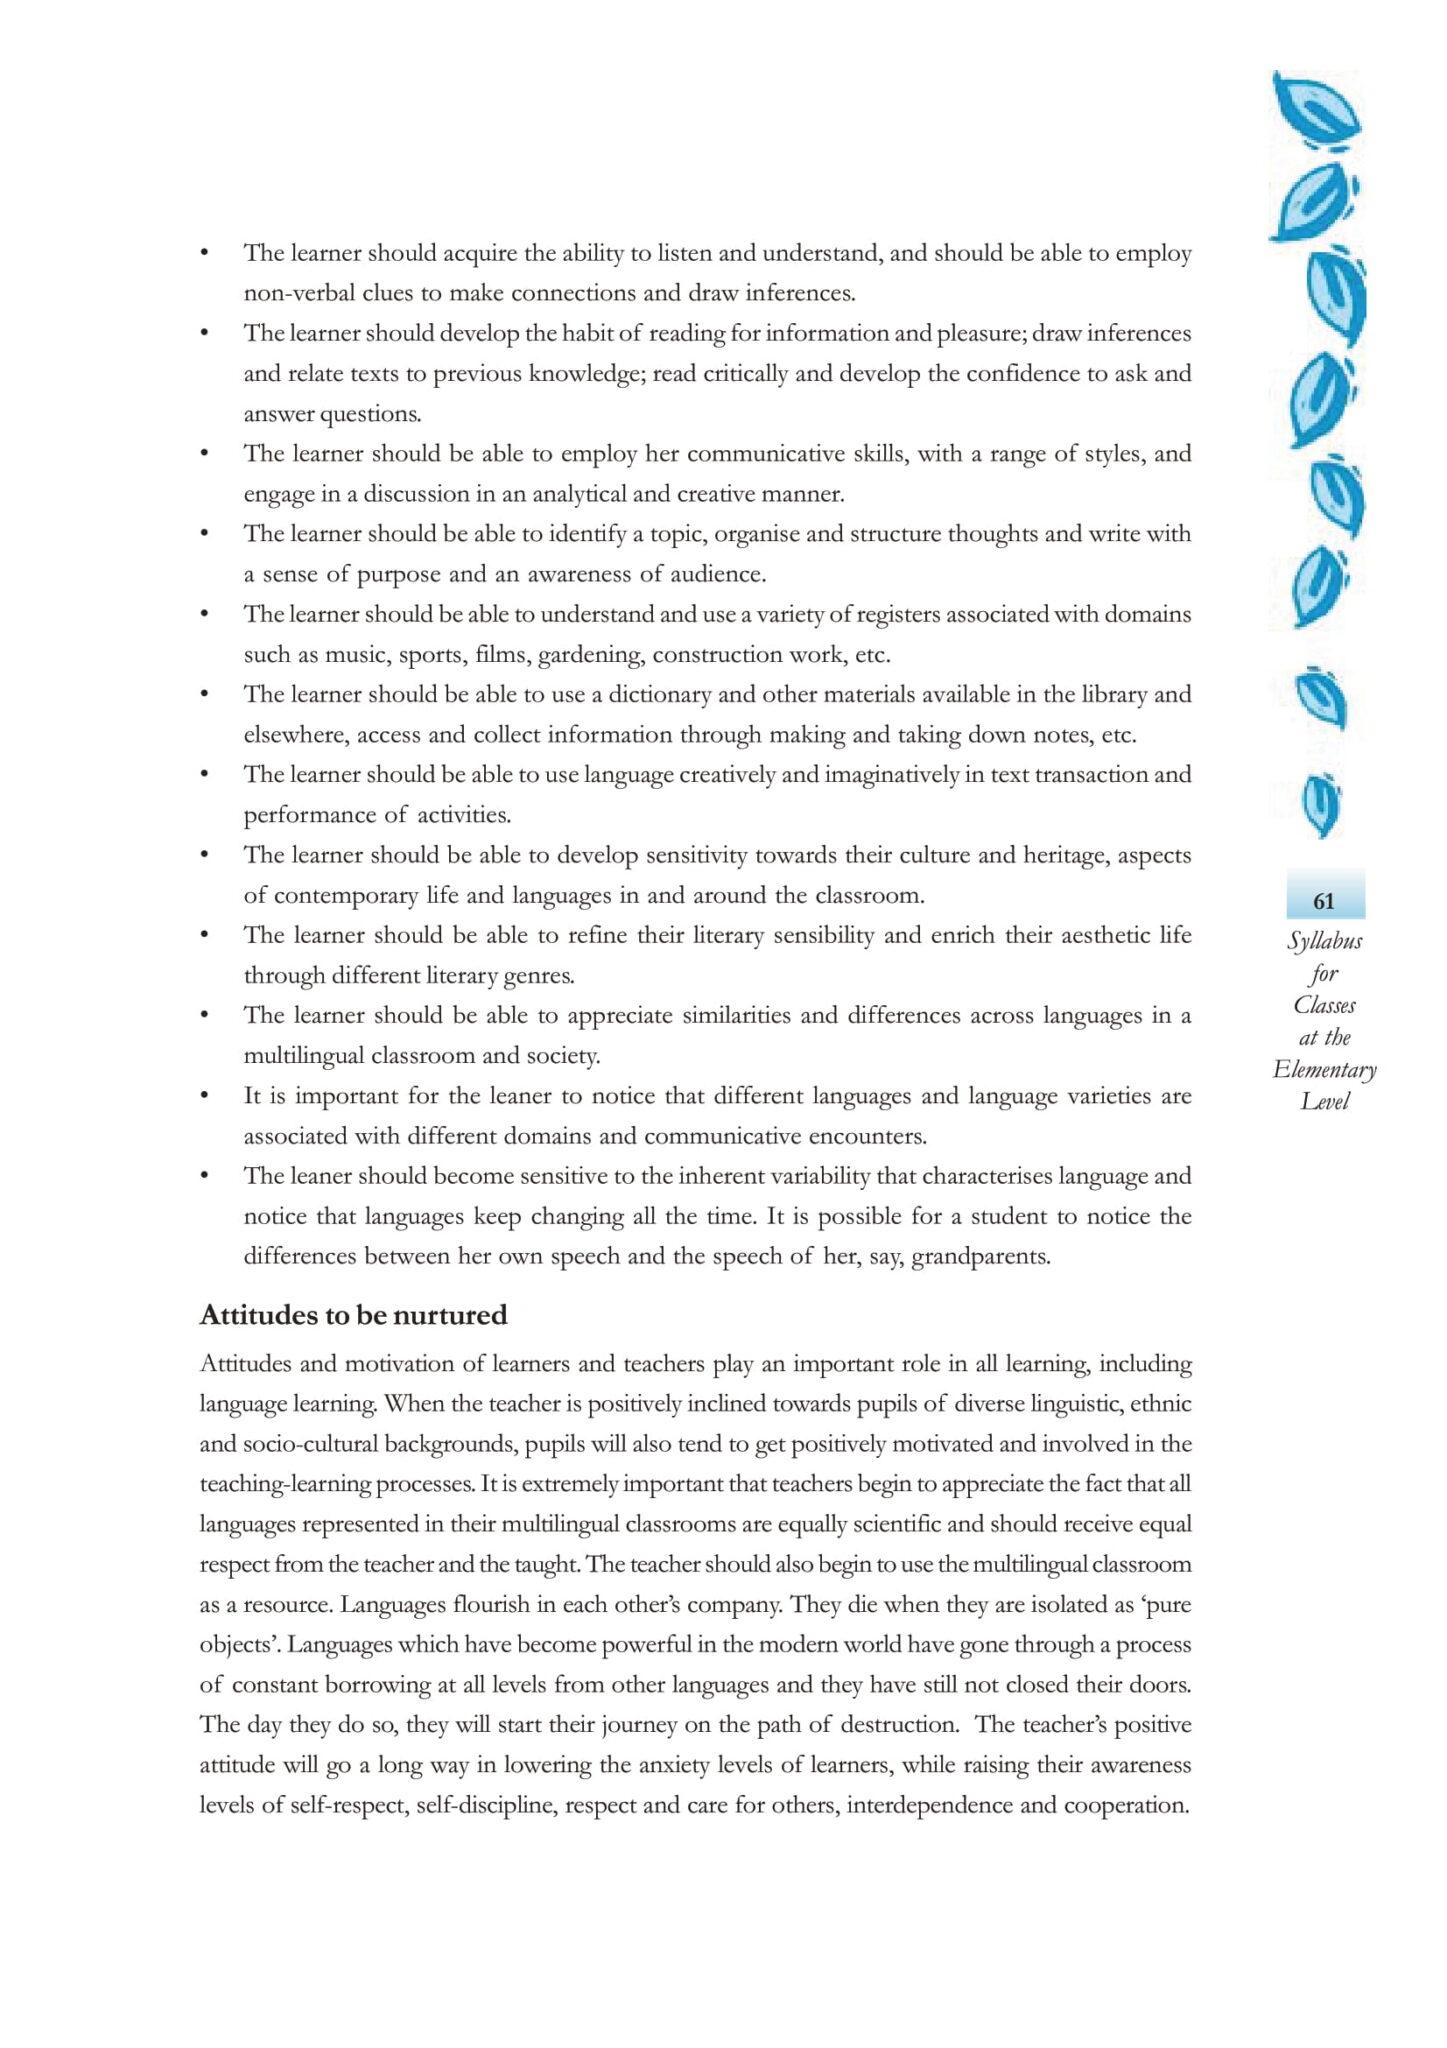 05English I VIII 04